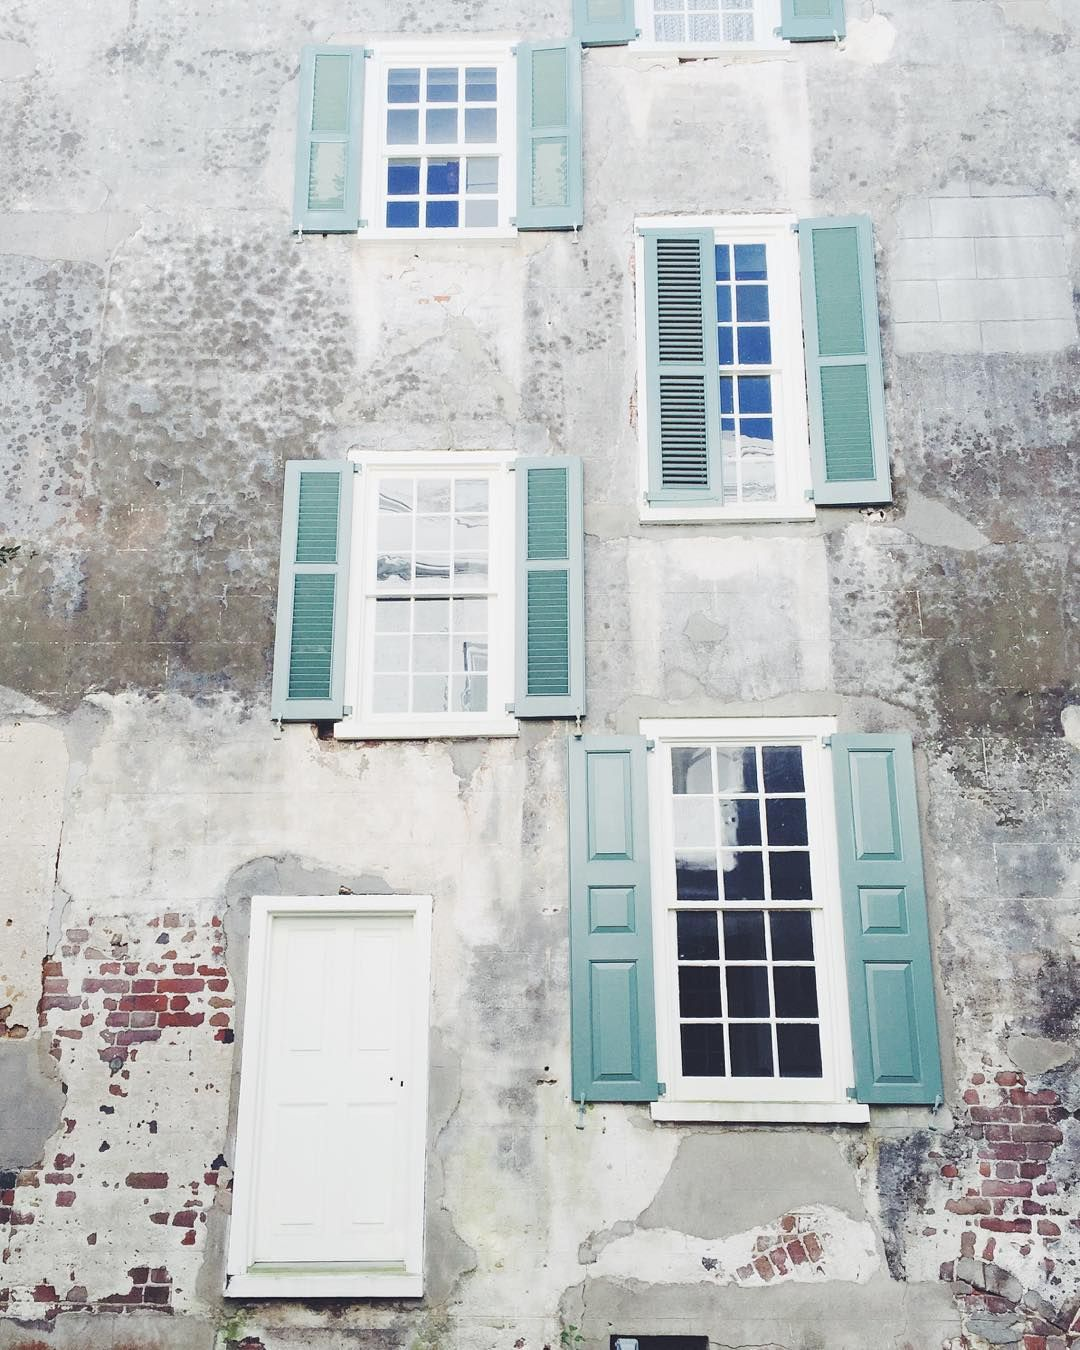 Architectural mysteries. #doorsofcharleston #windows #architecture #historiccharleston #charleston #texture #vsco by kimgrahamphoto